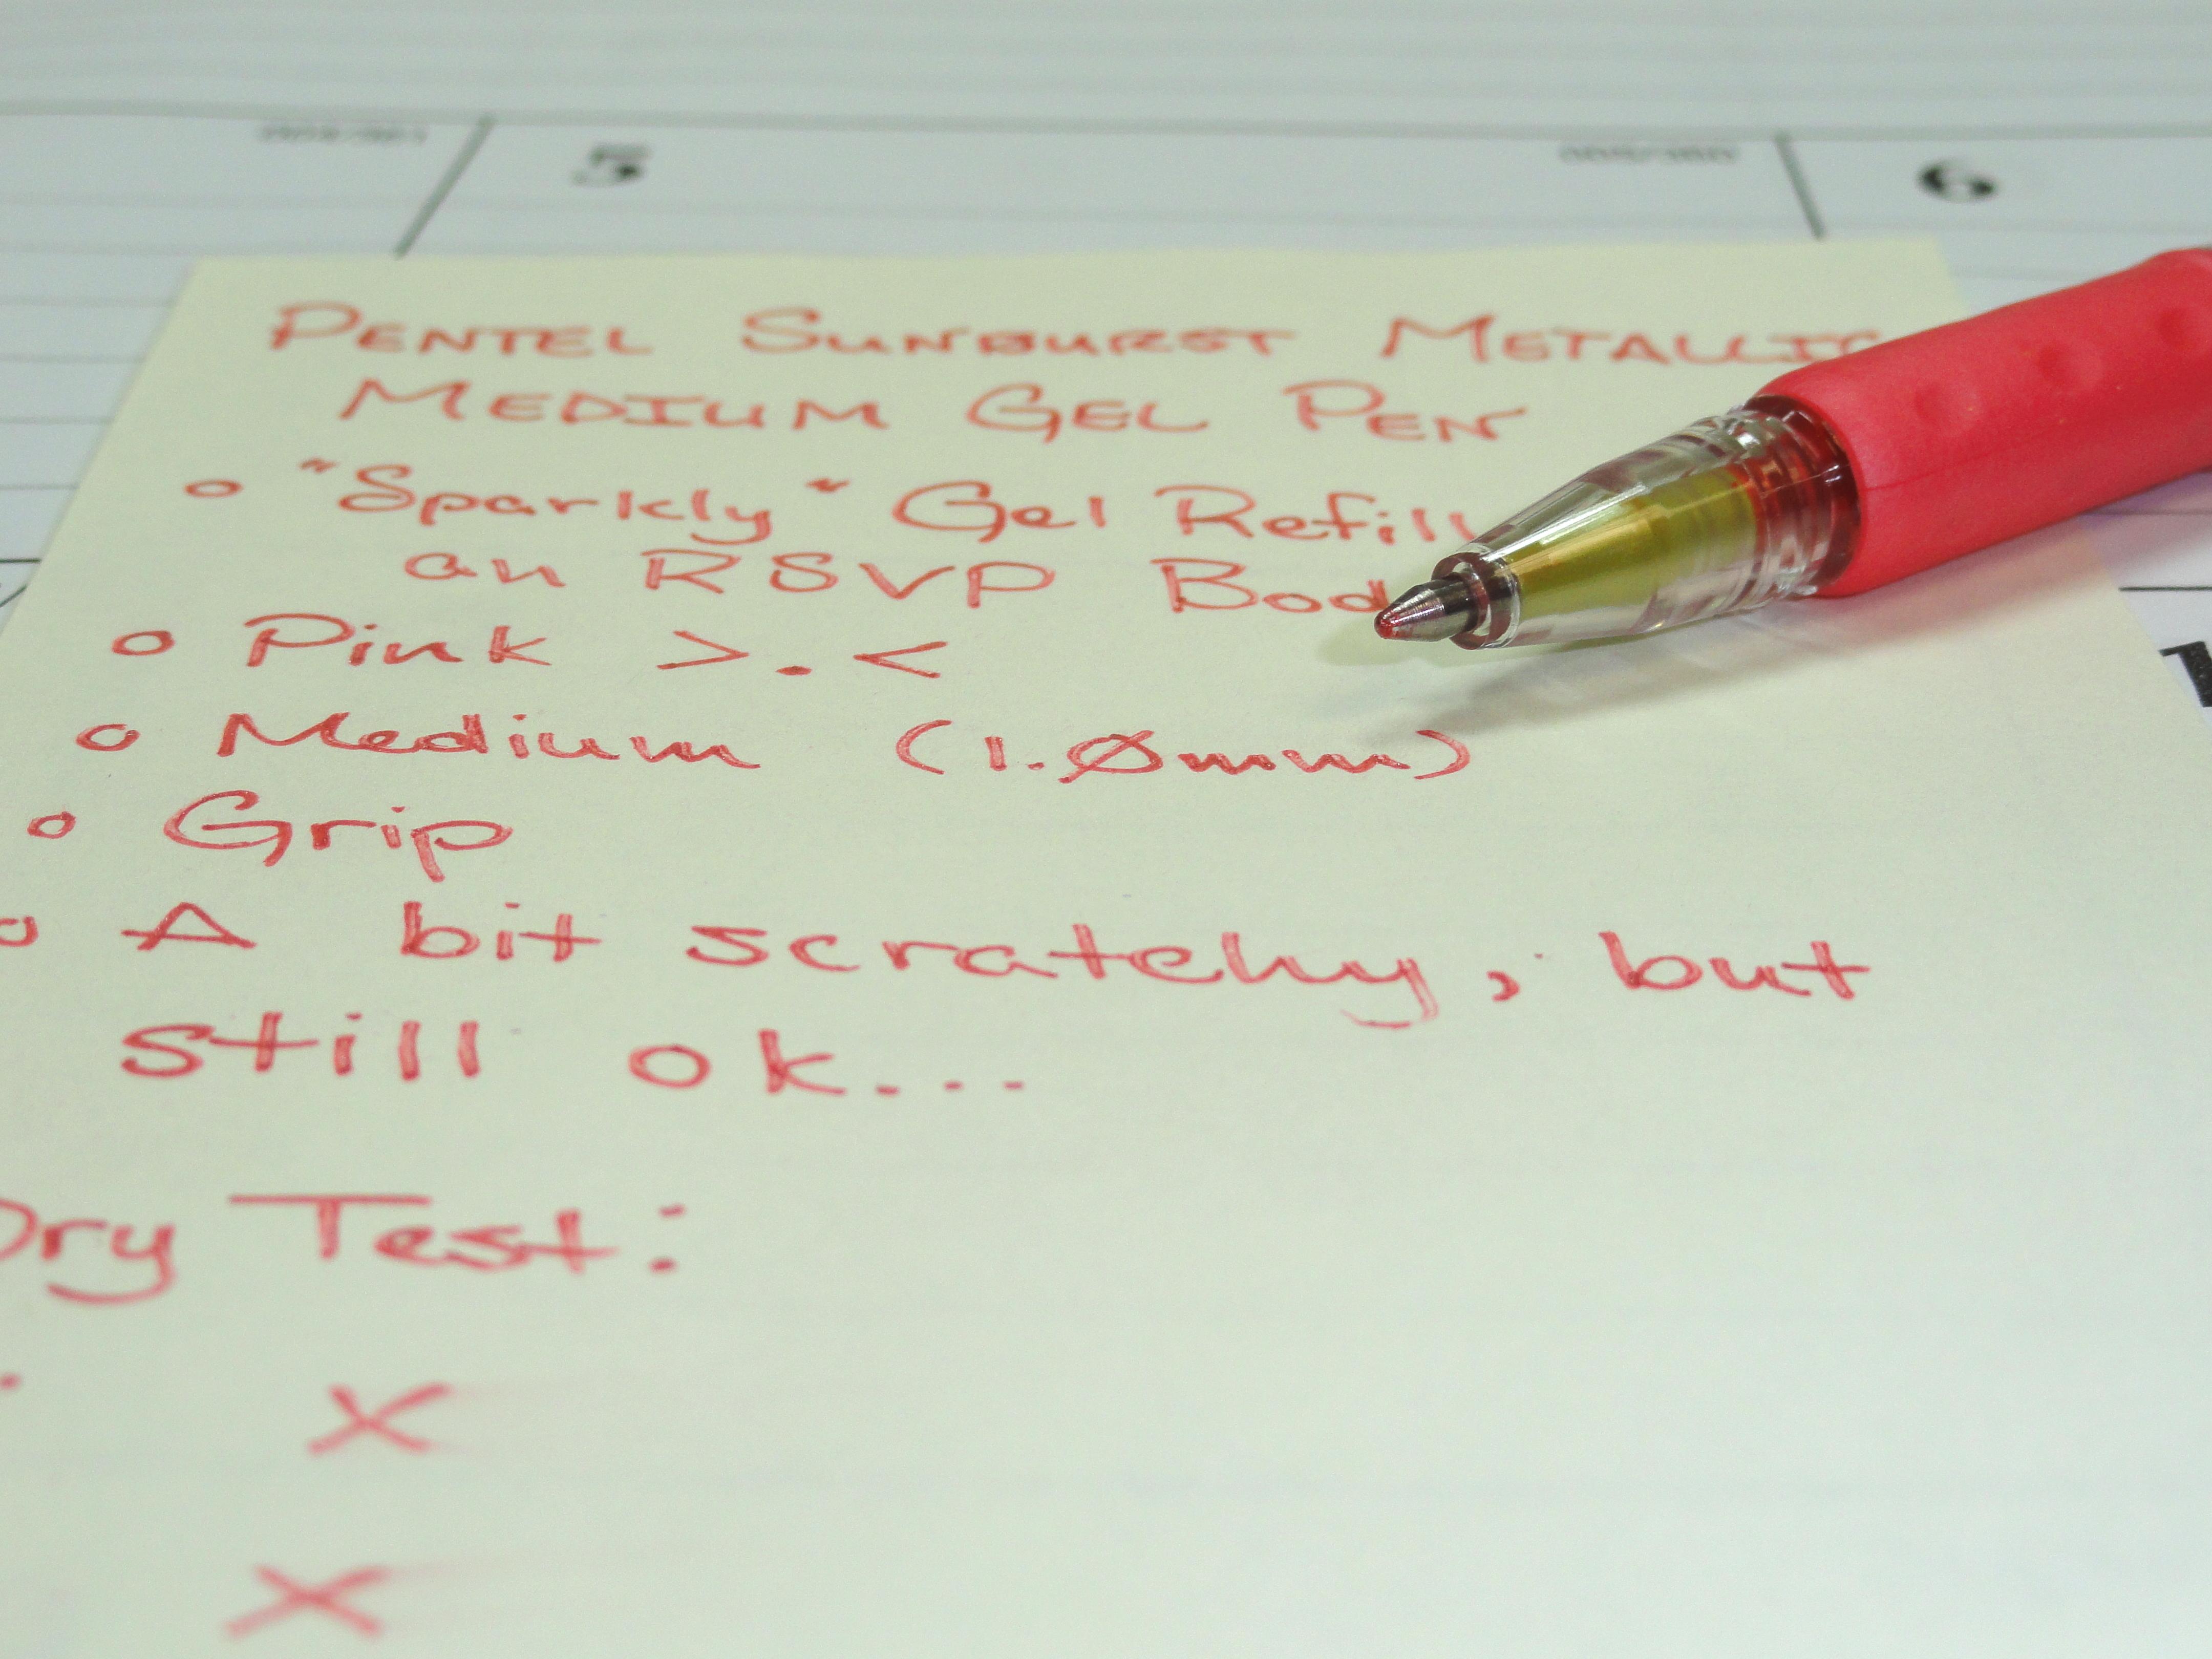 Pentel Sunburst Metallic Pink Medium Gel Pen